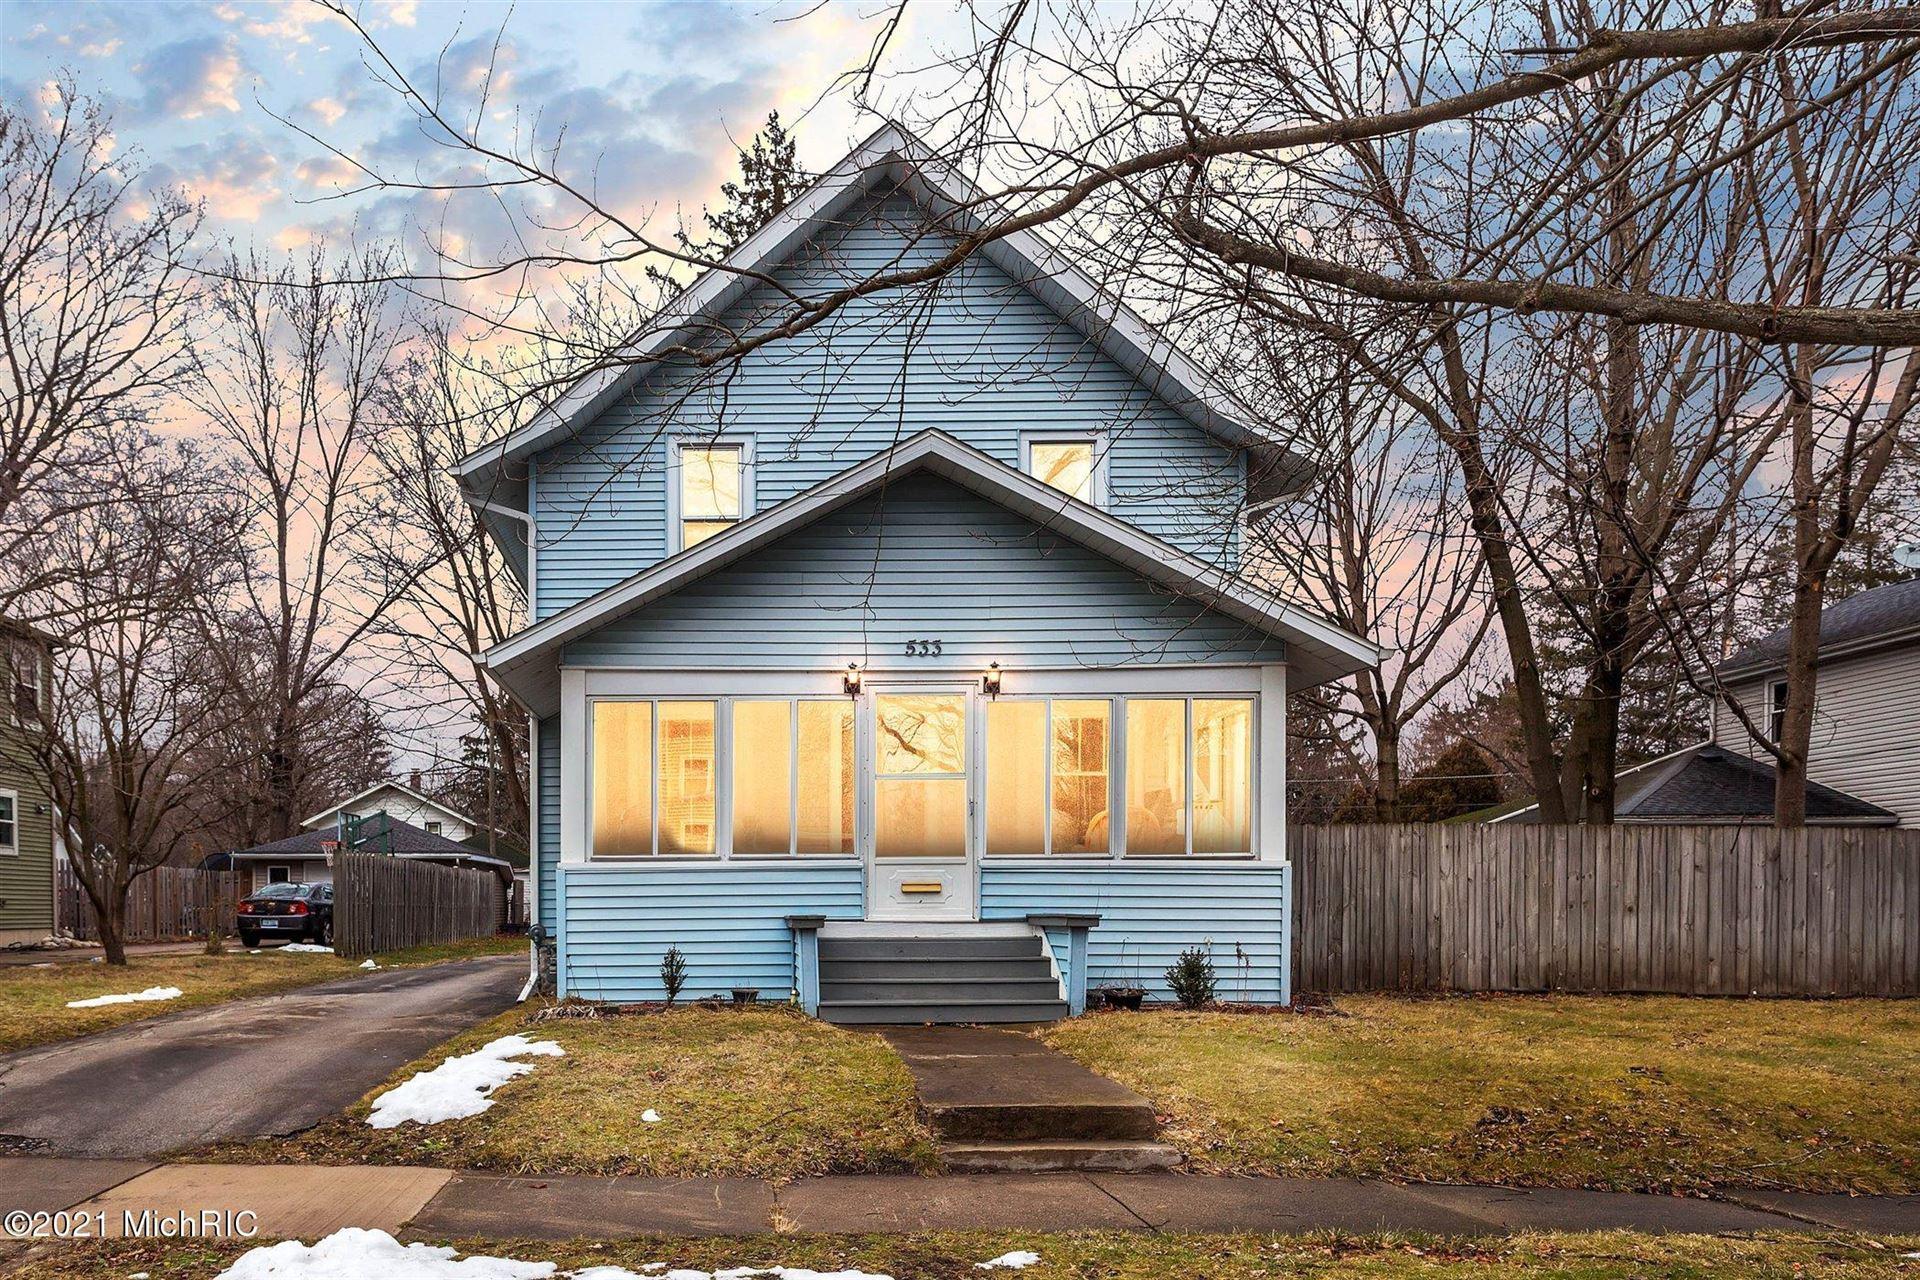 Photo for 533 Union Street, Niles, MI 49120 (MLS # 21001654)